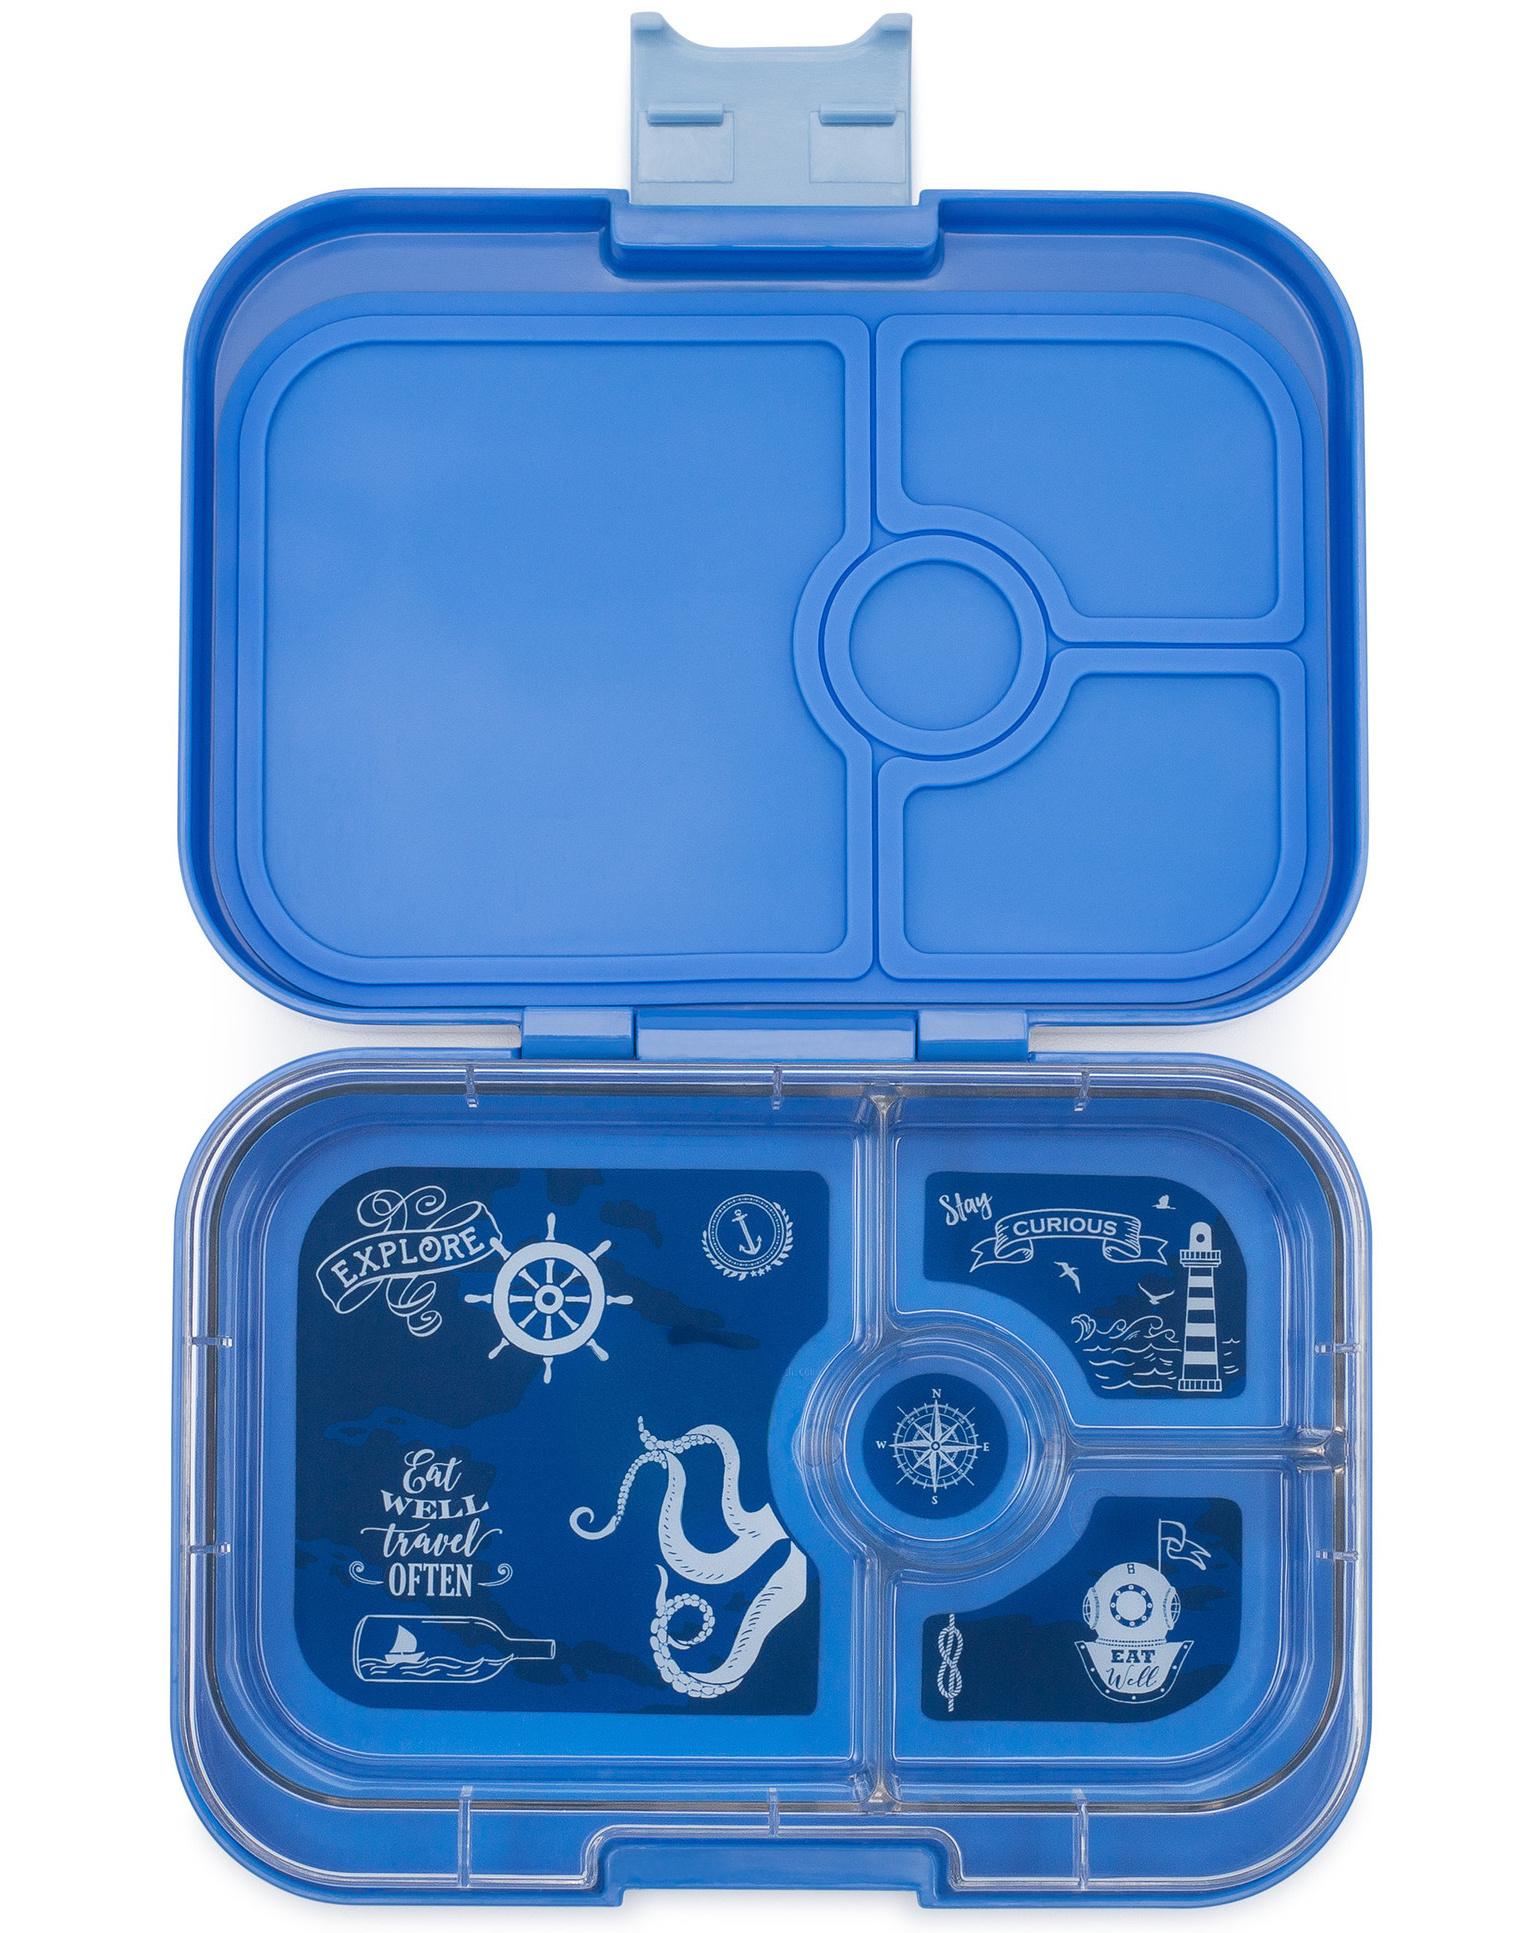 Yumbox Panino broodtrommel 4 vakken, Jodphur blauw / Explore tray-1